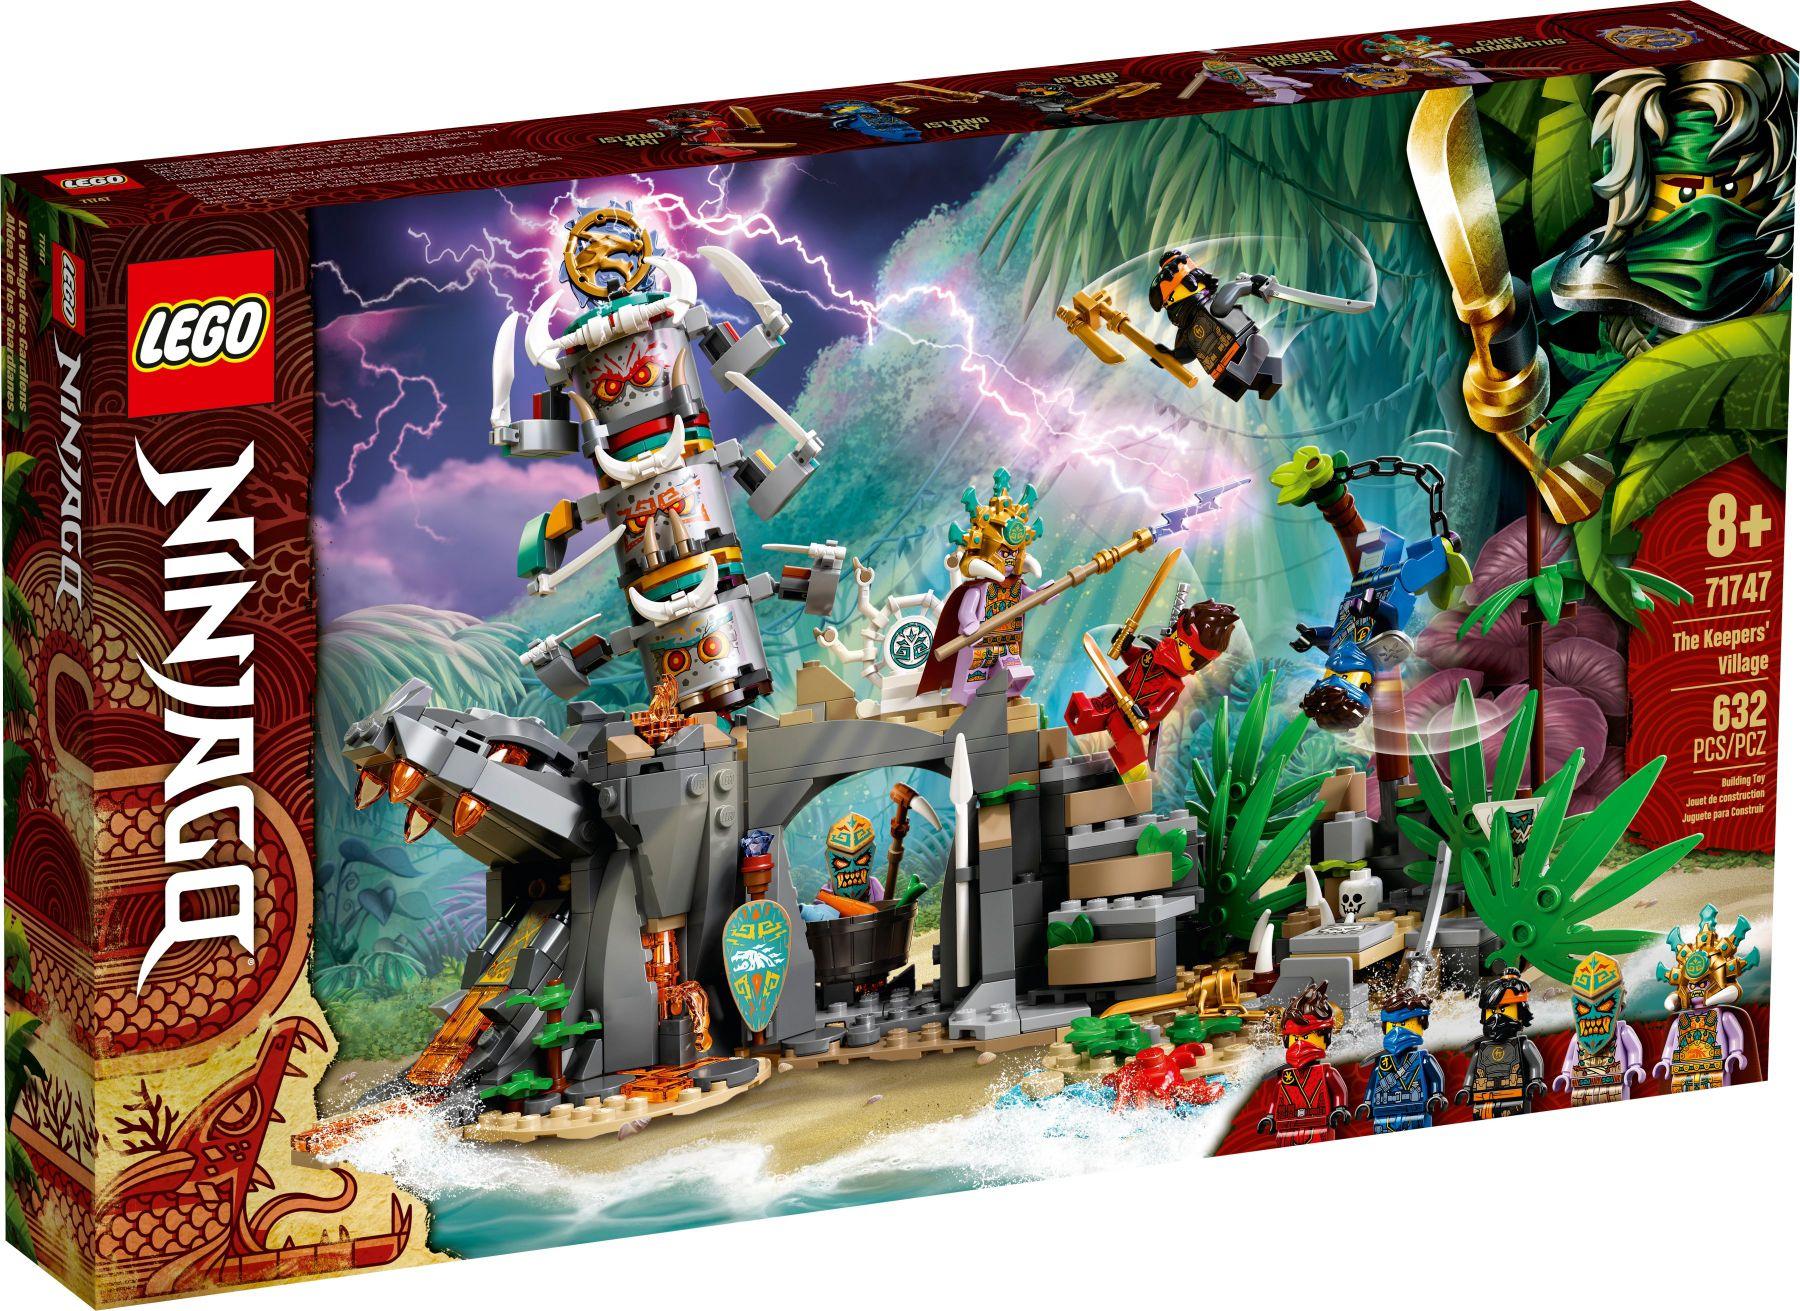 Alternate - Lego Ninjago 71747 Das Dorf der Wächter